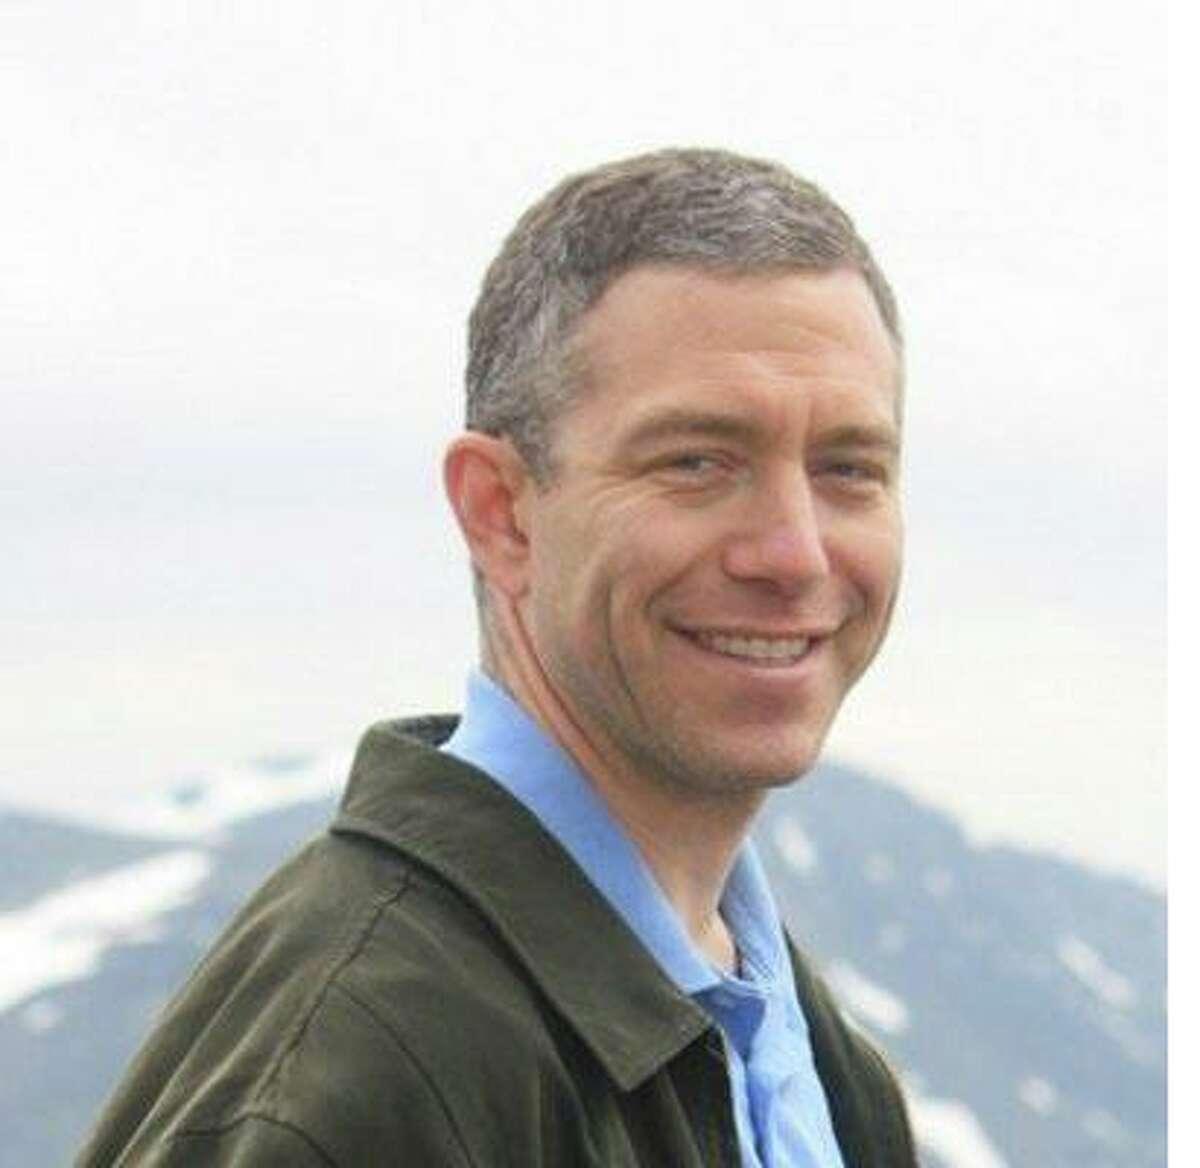 Ari Rosenberg, executive director of the Association of Religious Communities in Danbury.